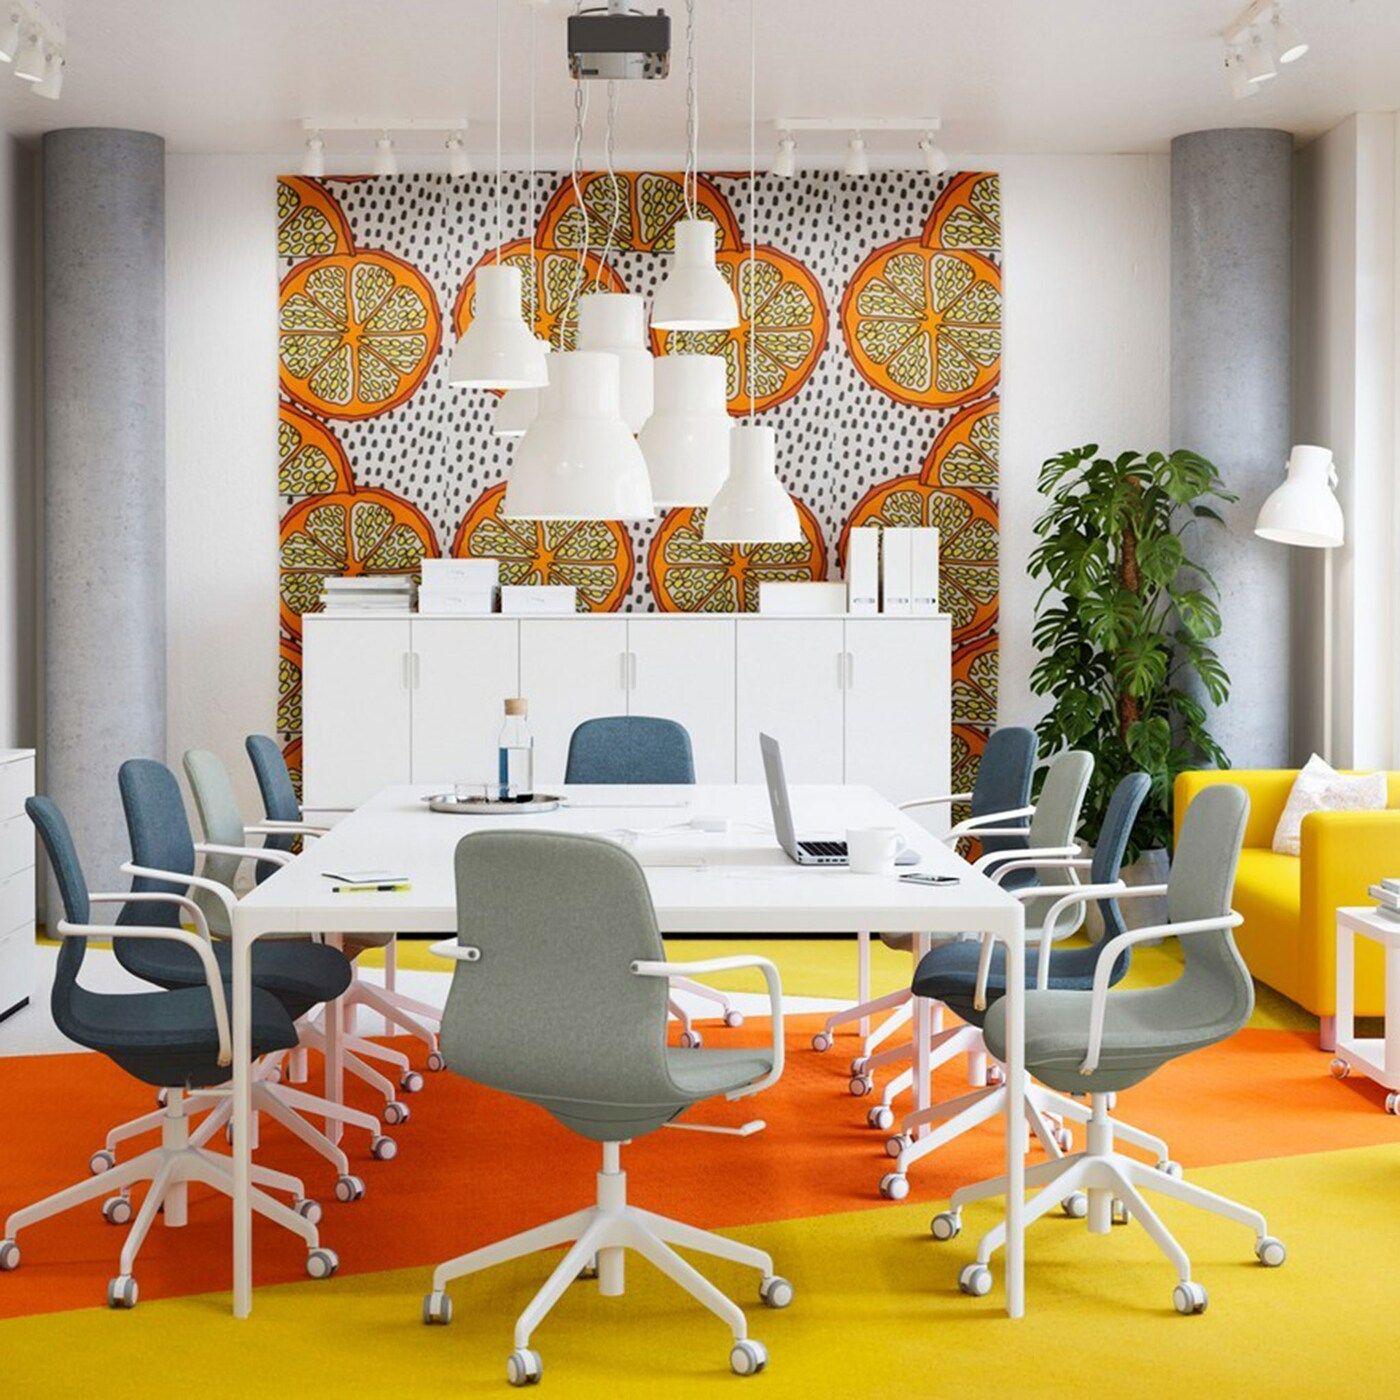 Business gallery Ikea wall decor, Diy wall decor for